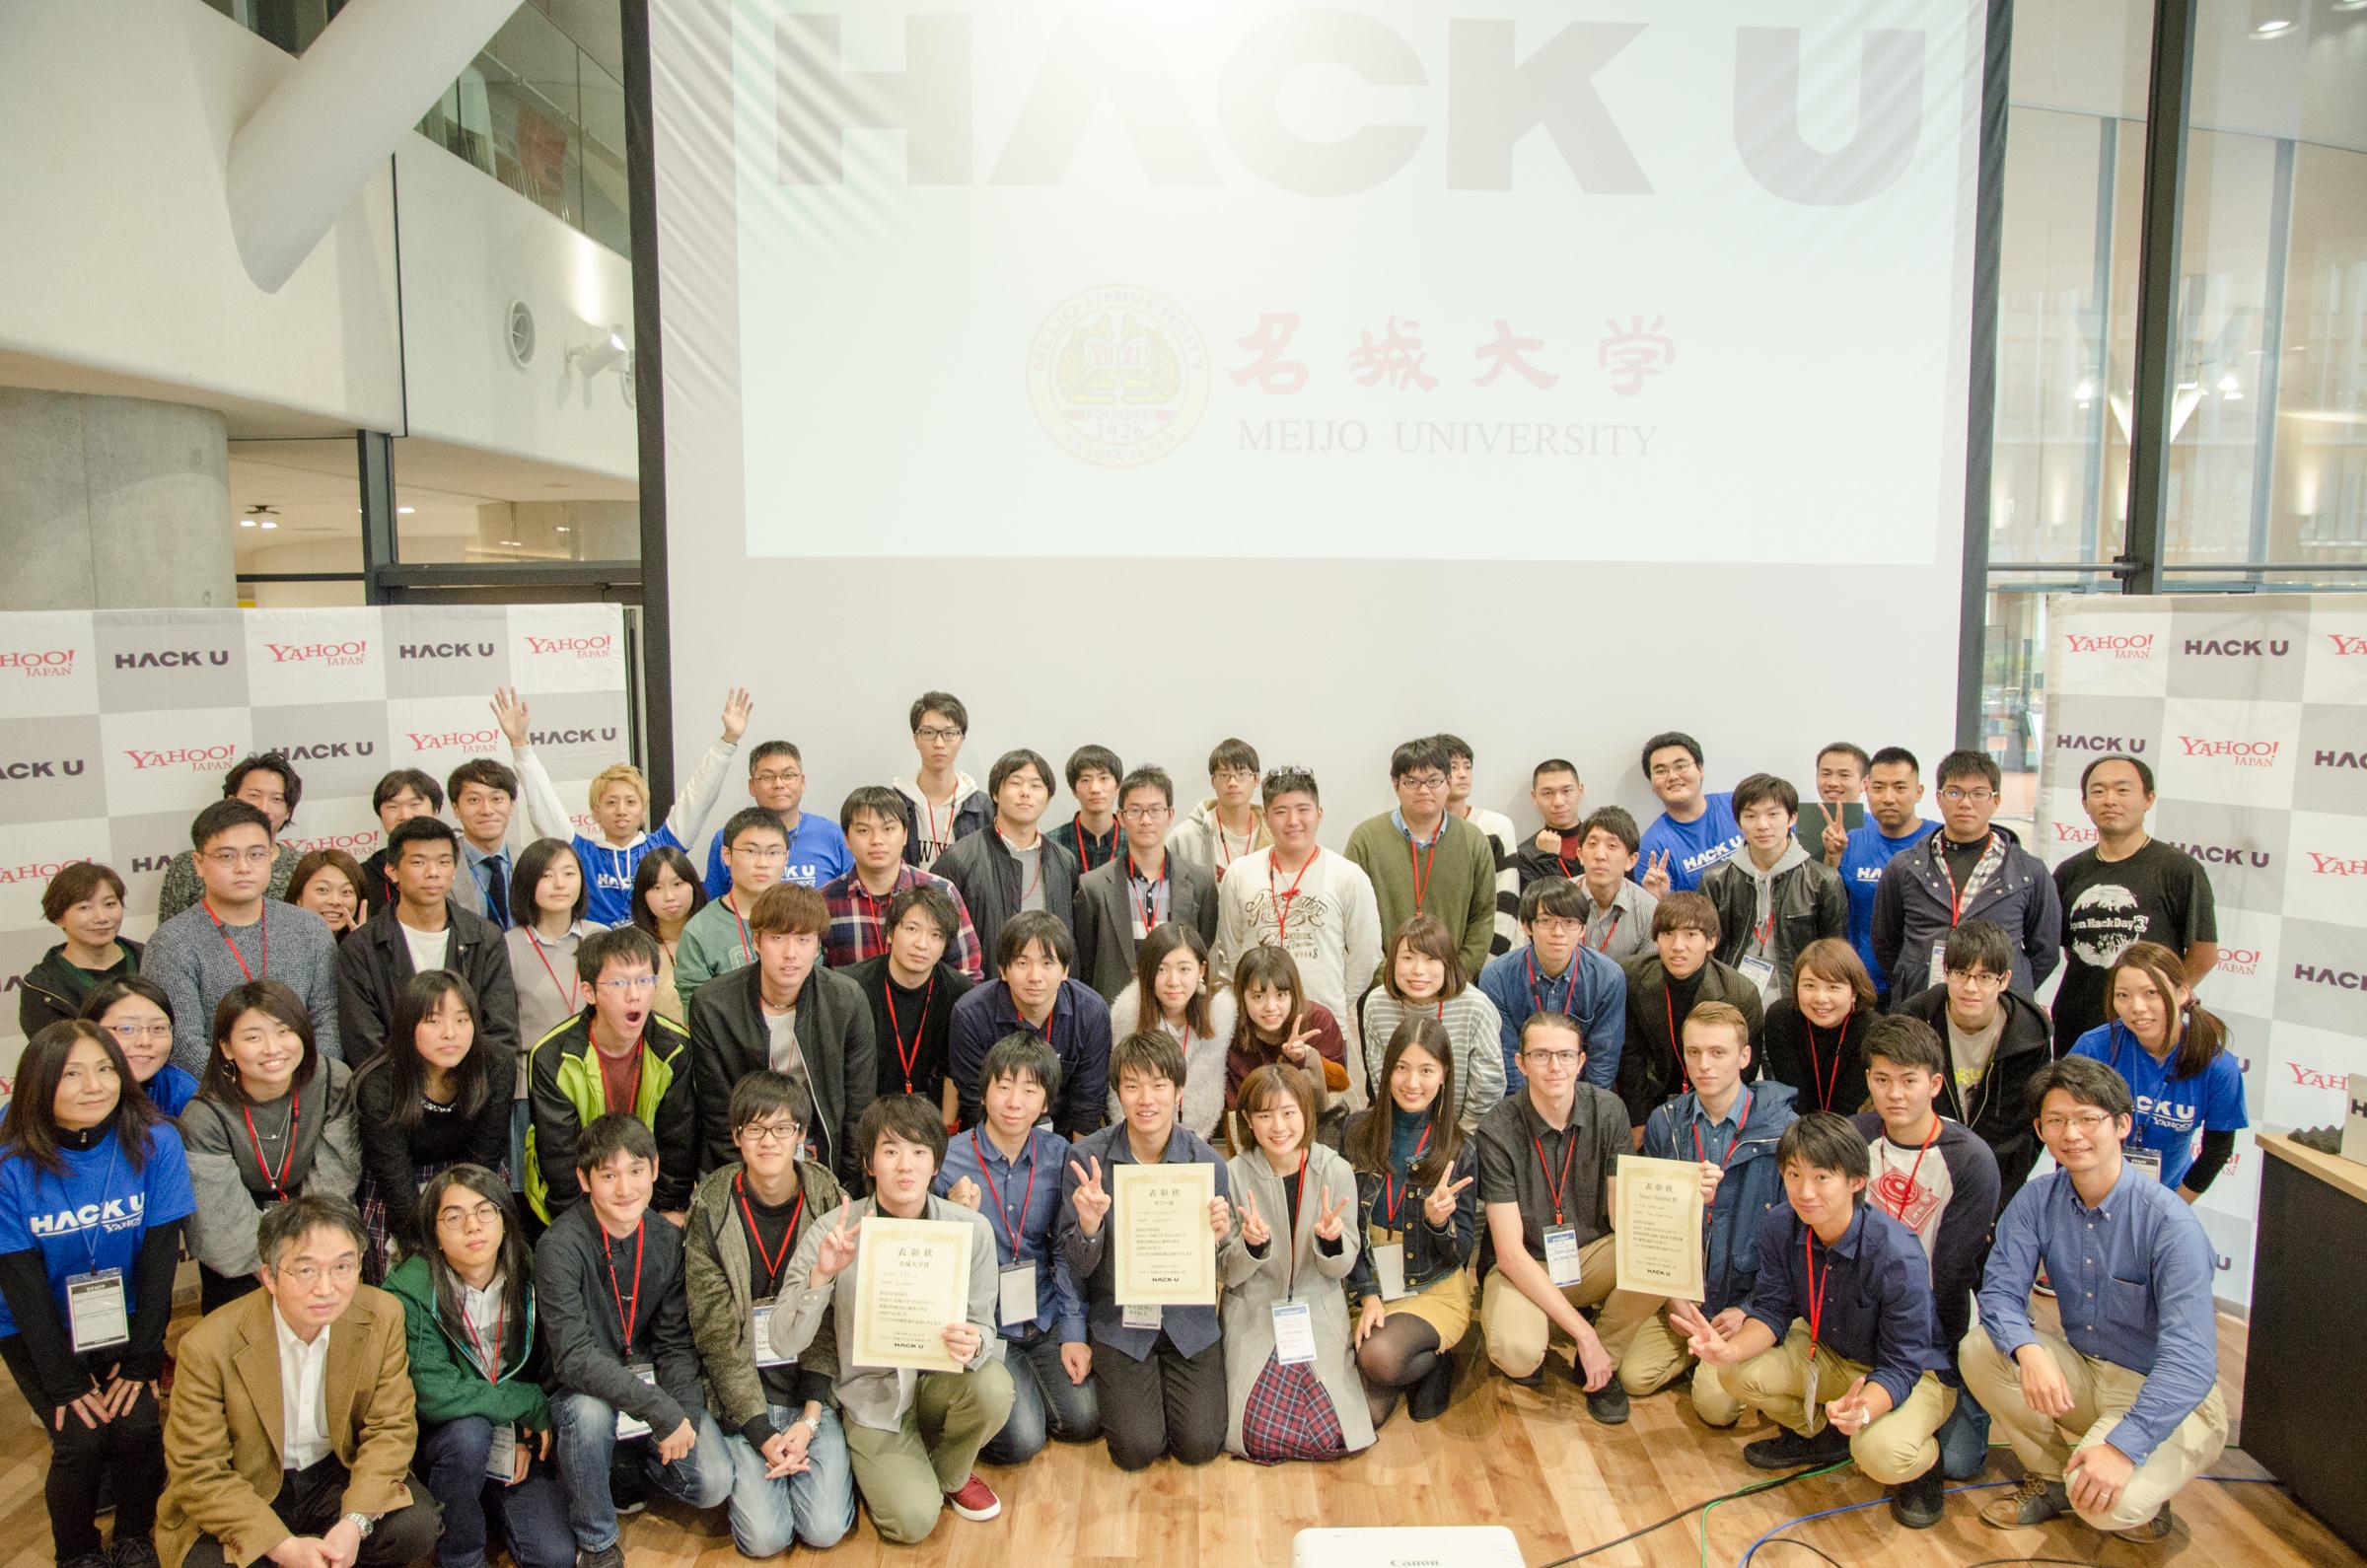 Hack U 名城大学 2018のキービジュアル画像